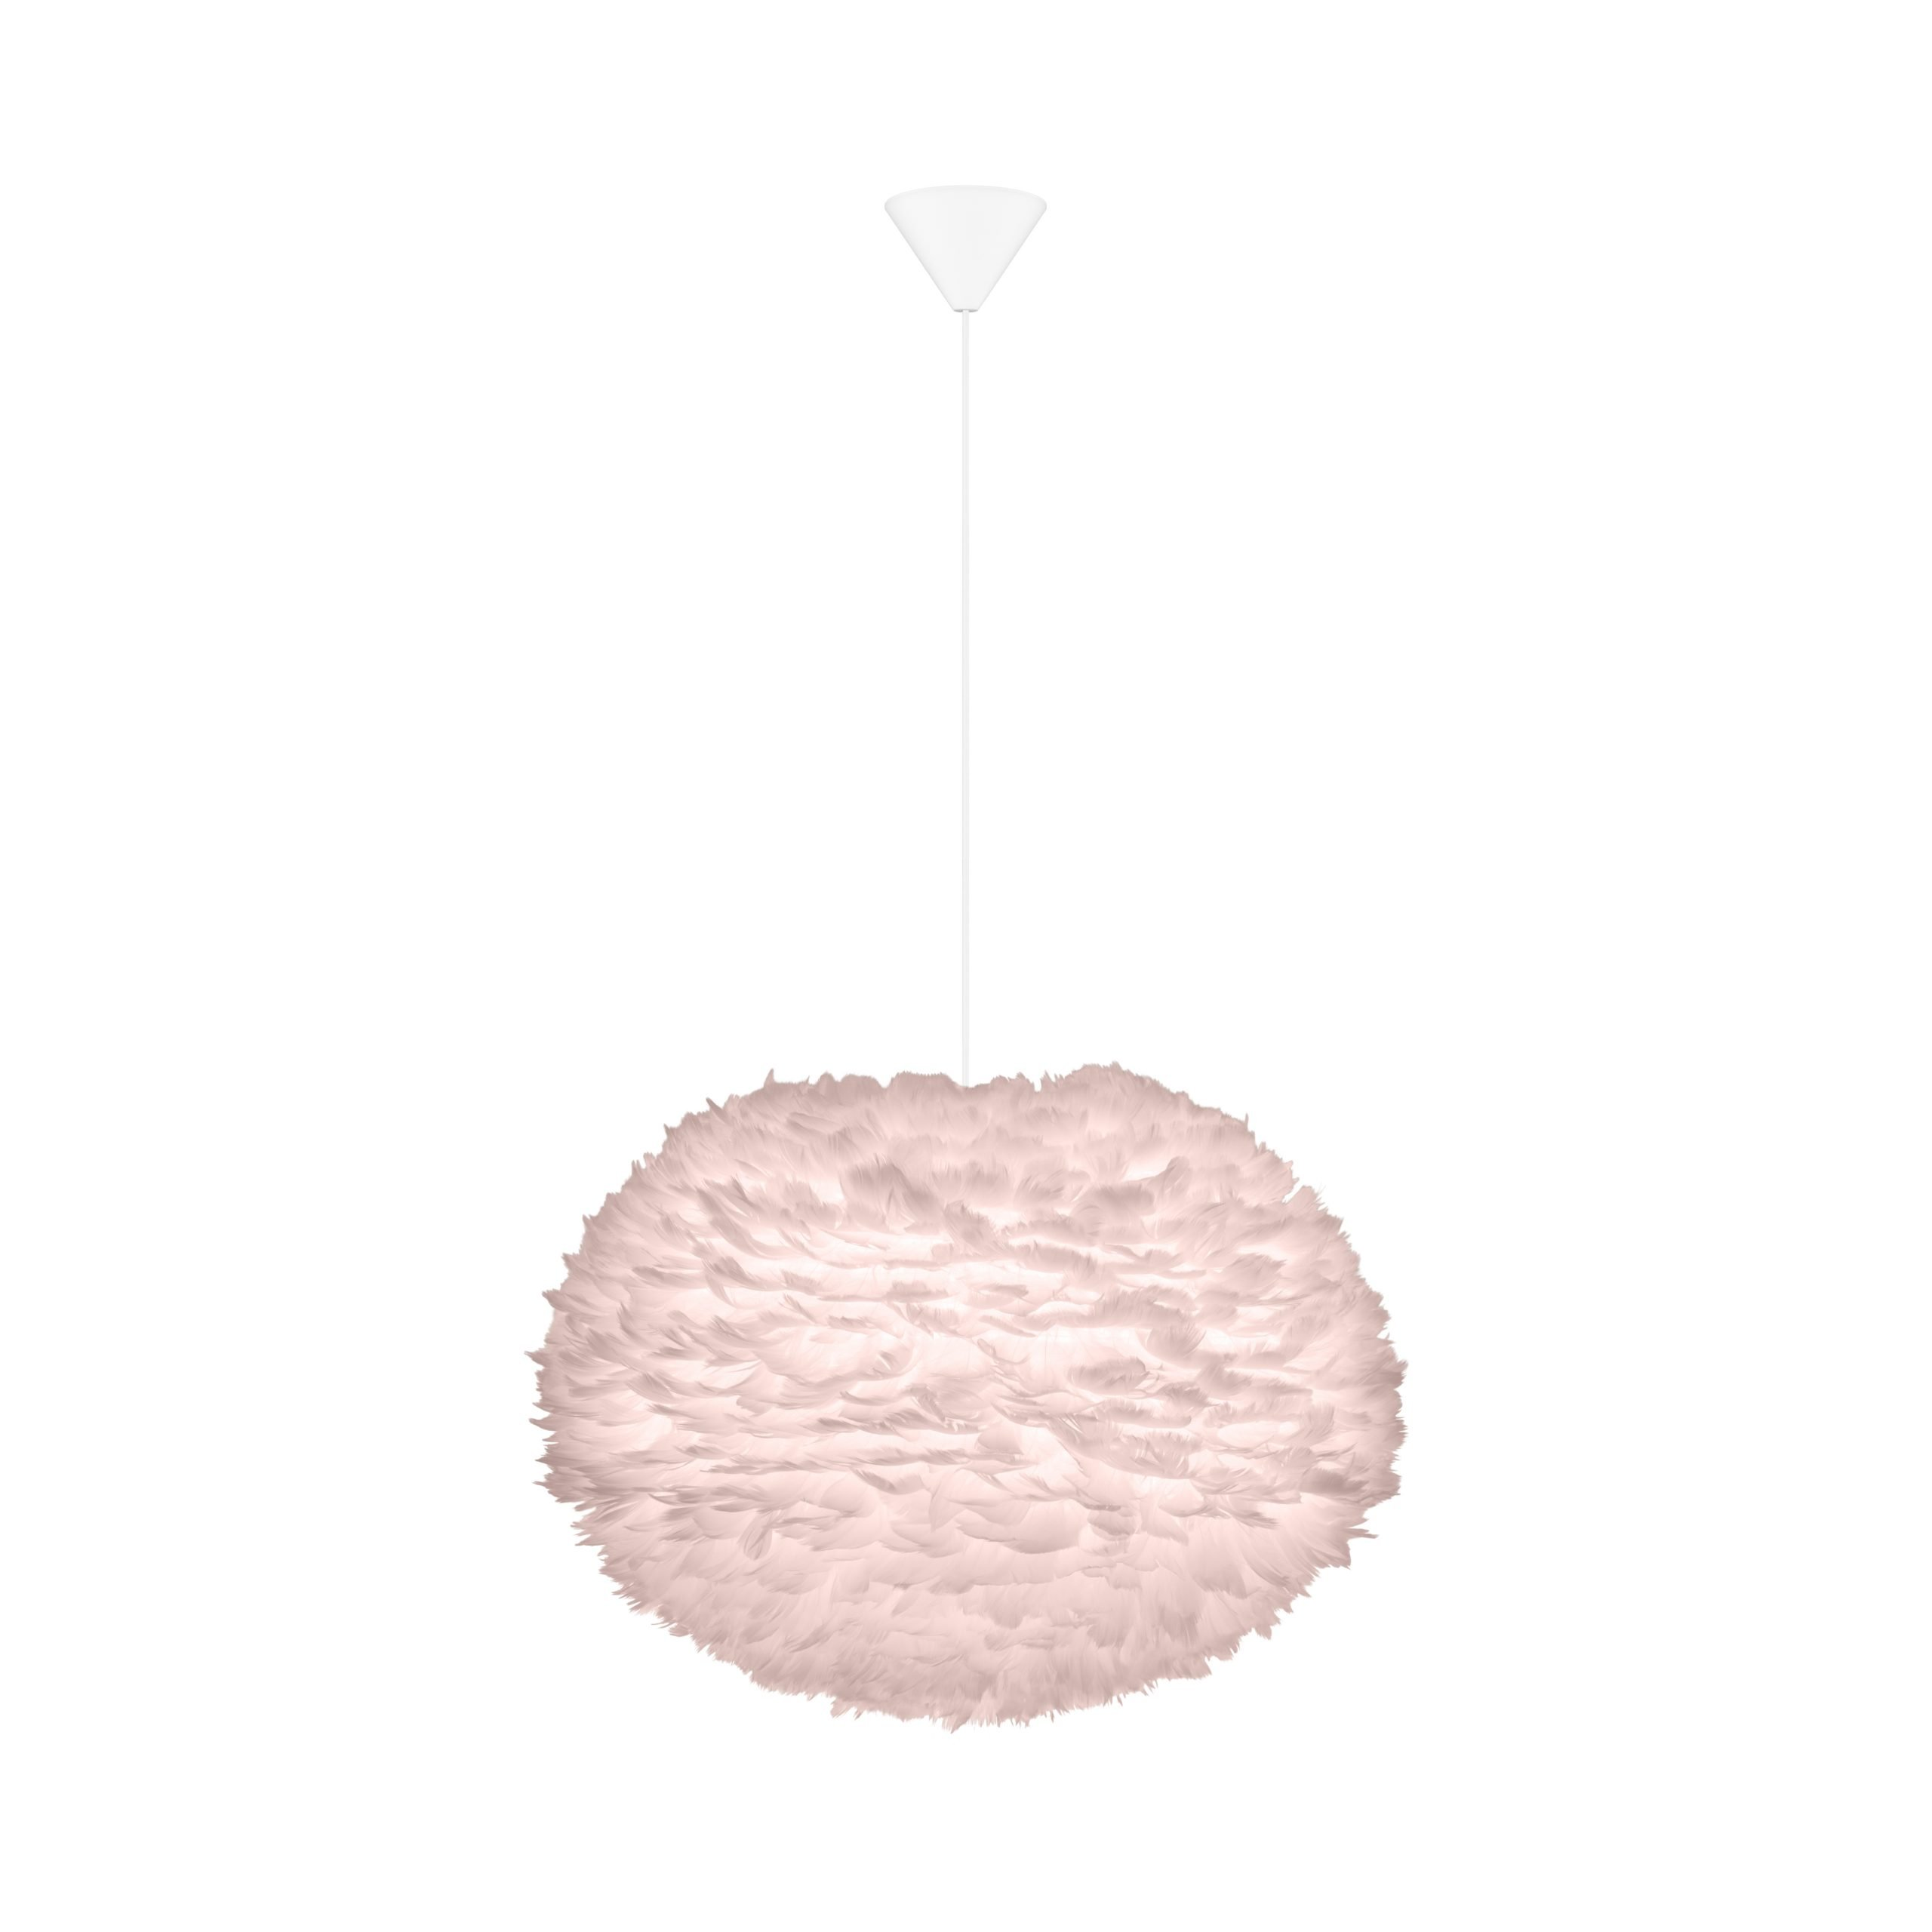 Hanglamp Umage Eos Licht Roze 65cm Large Inclusief Cordset Wit